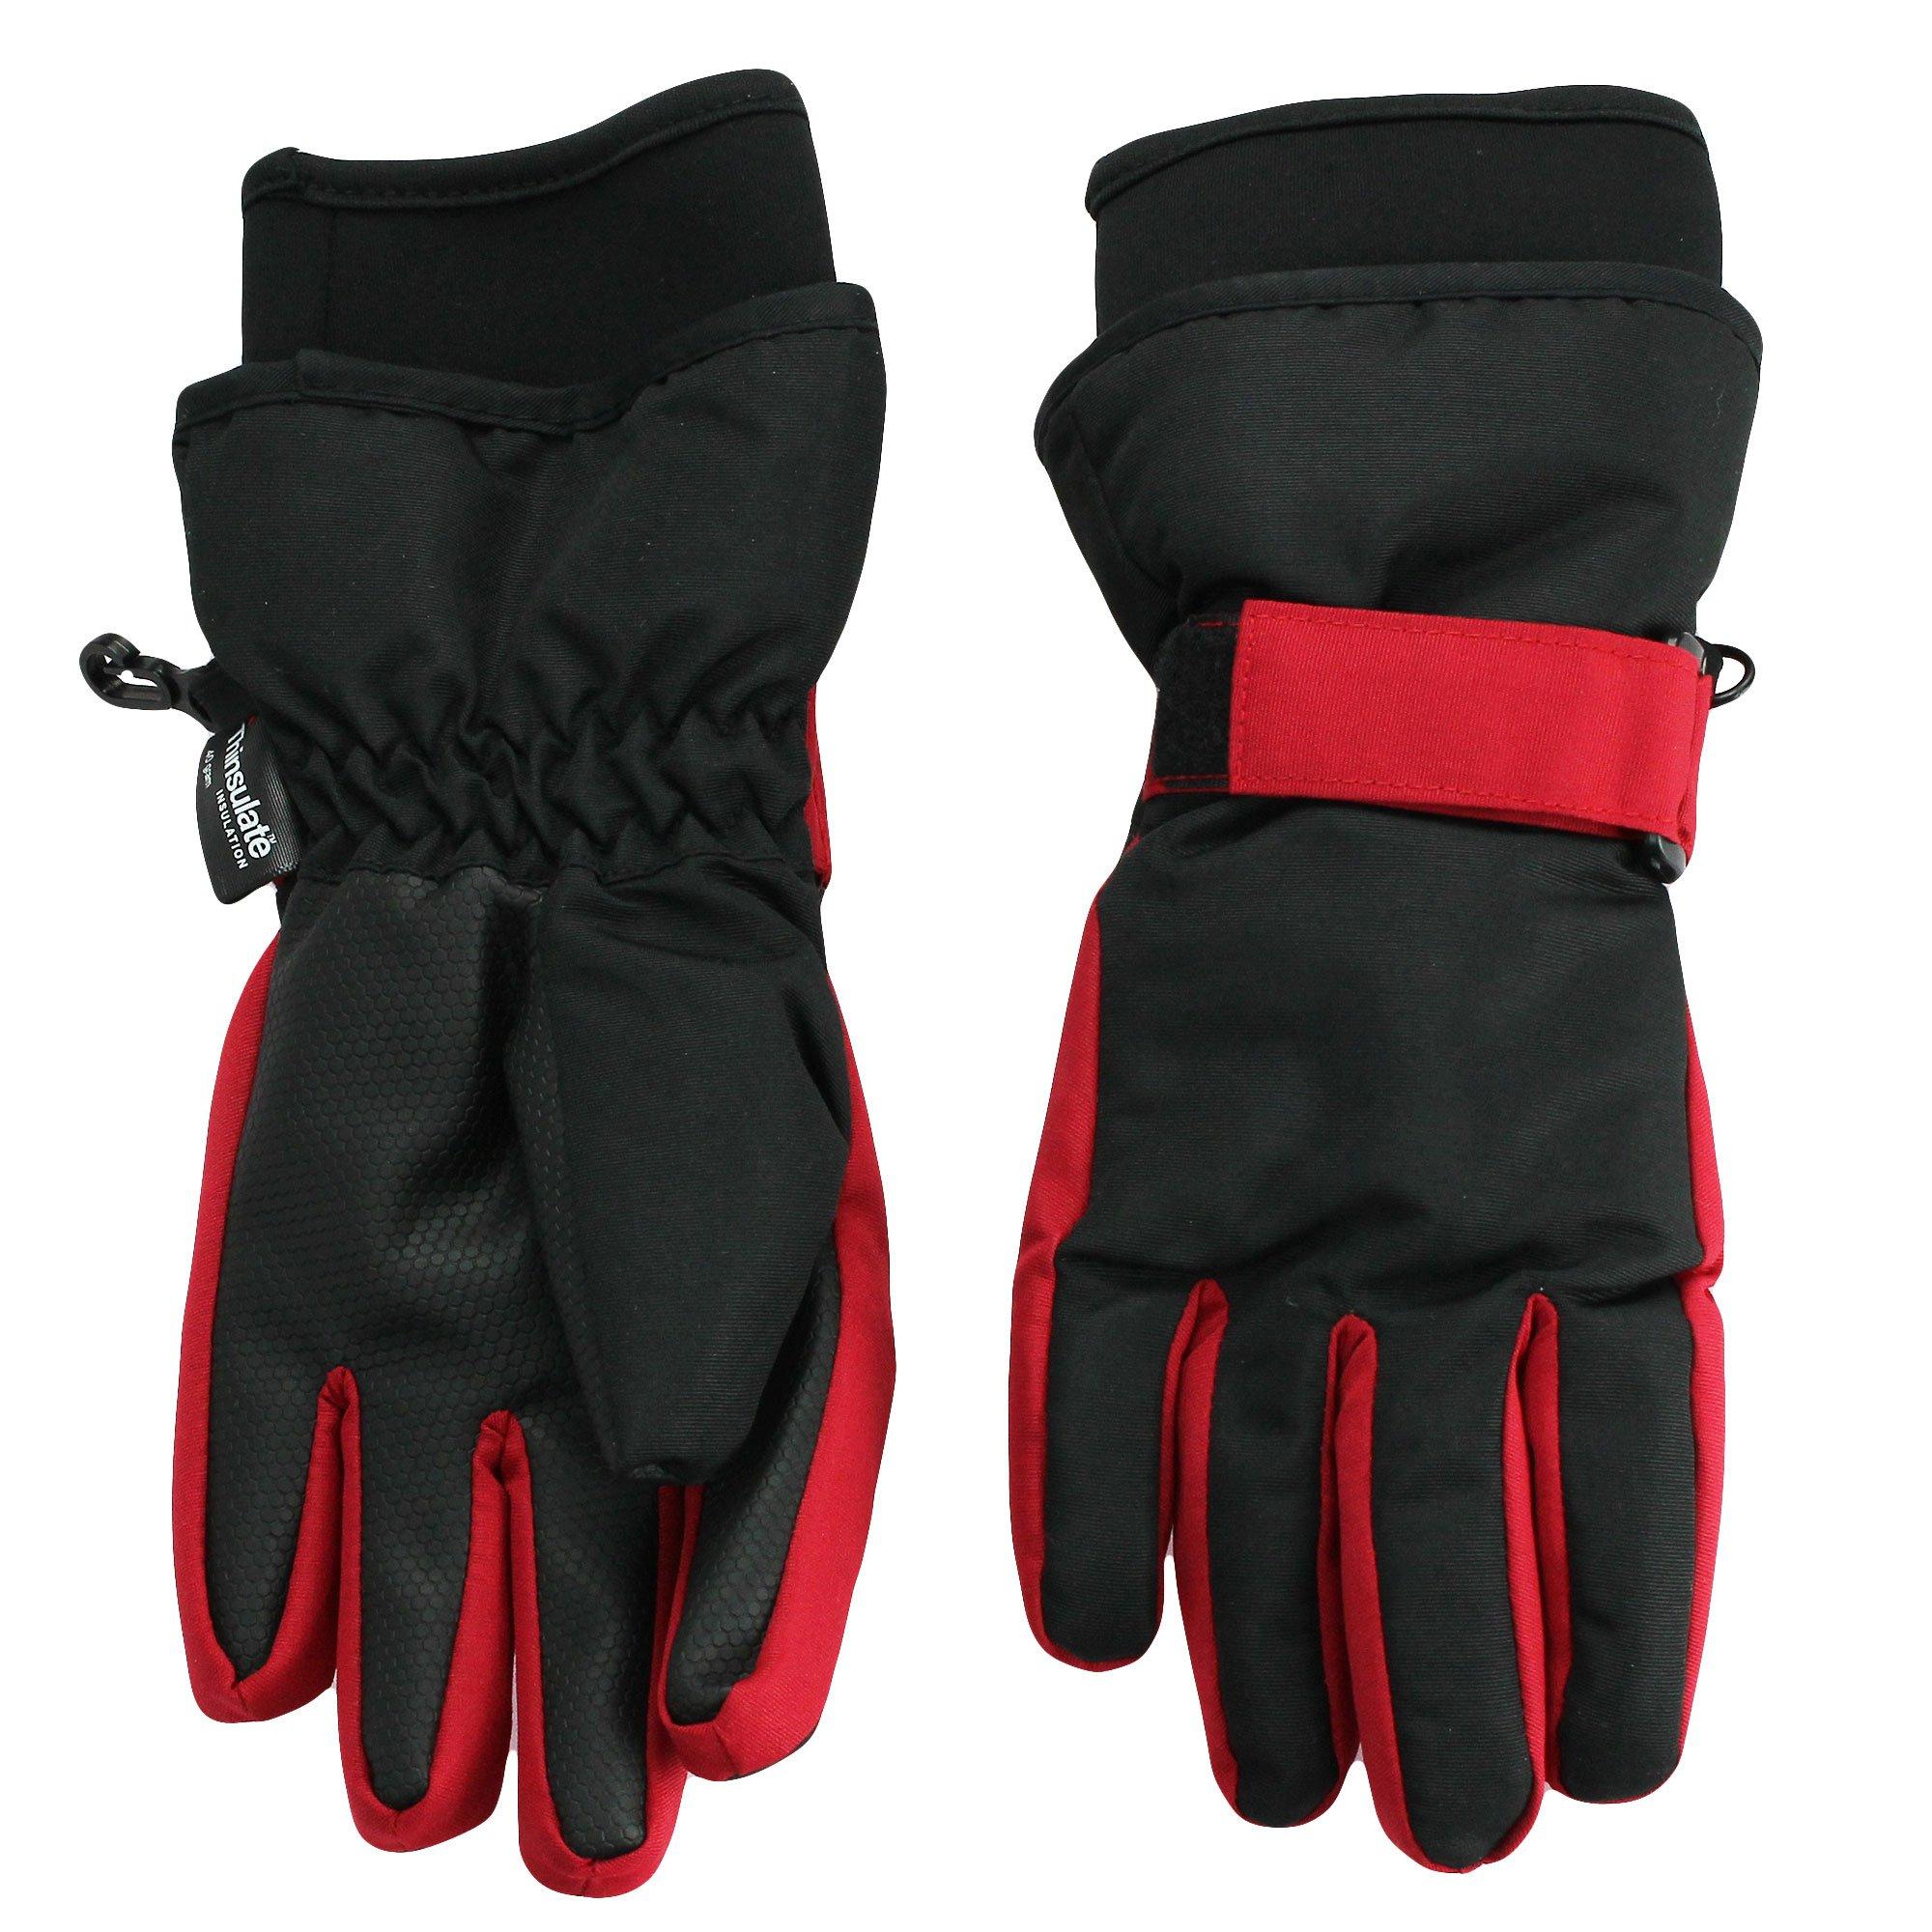 Nolan Gloves Big Boys' Sn'Owen Neoprene Cuff Ski Glove, Red/Black, Large/X-large